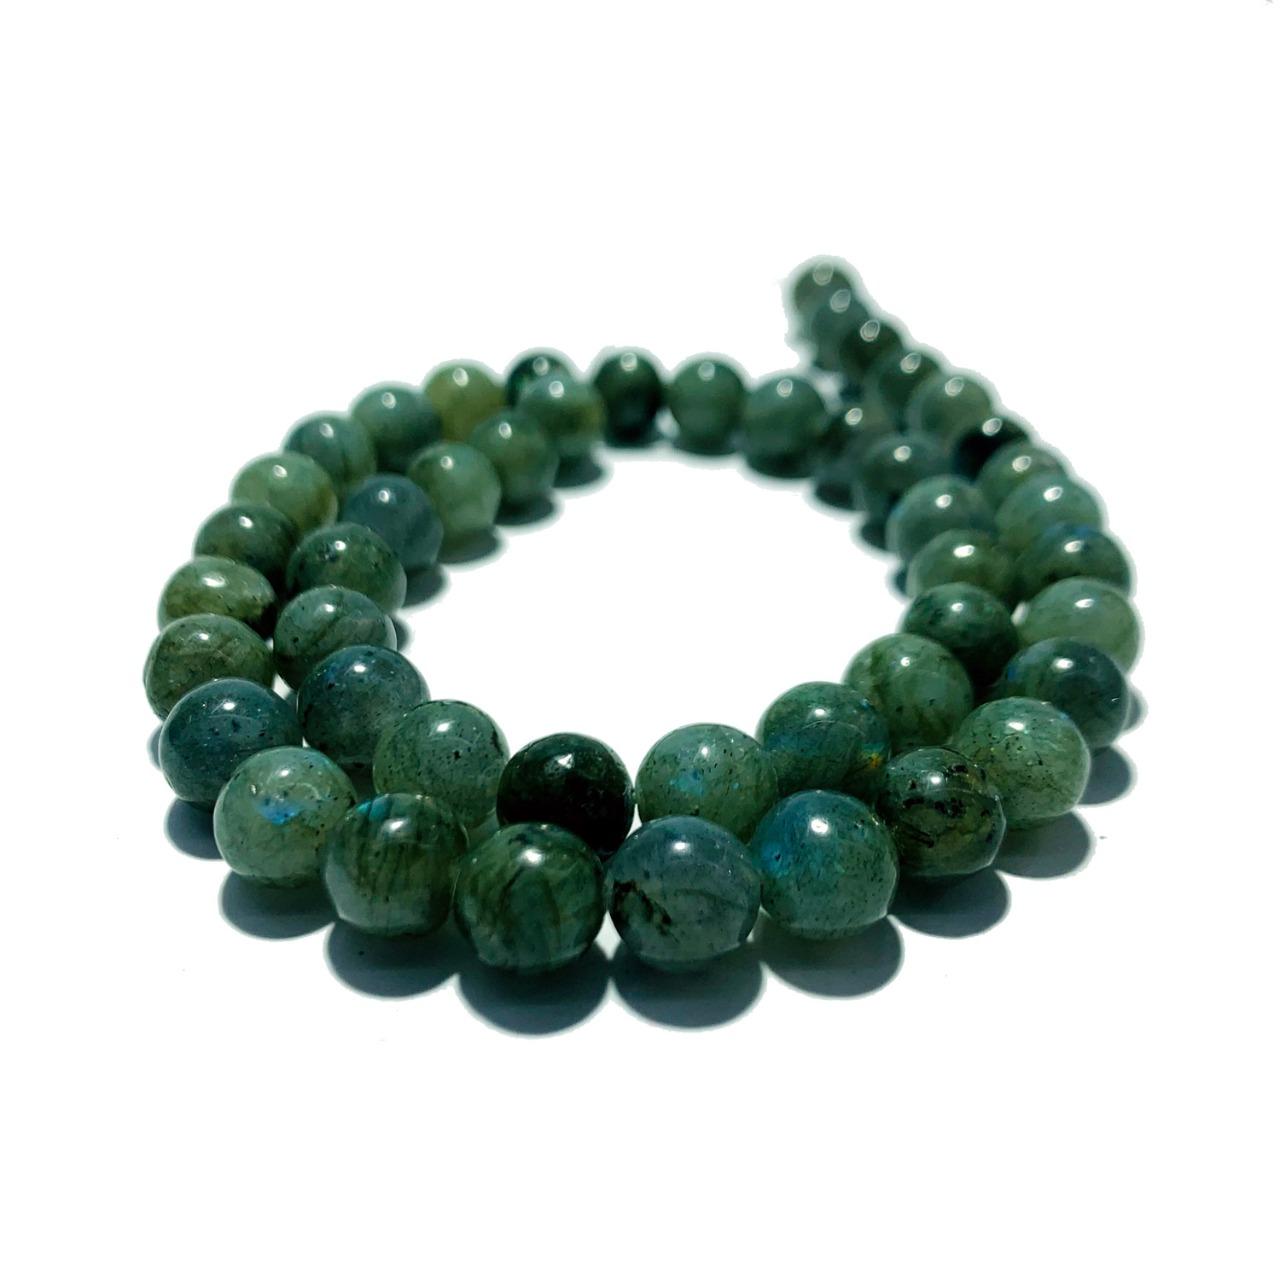 Pedra Natural Labradorita Verde